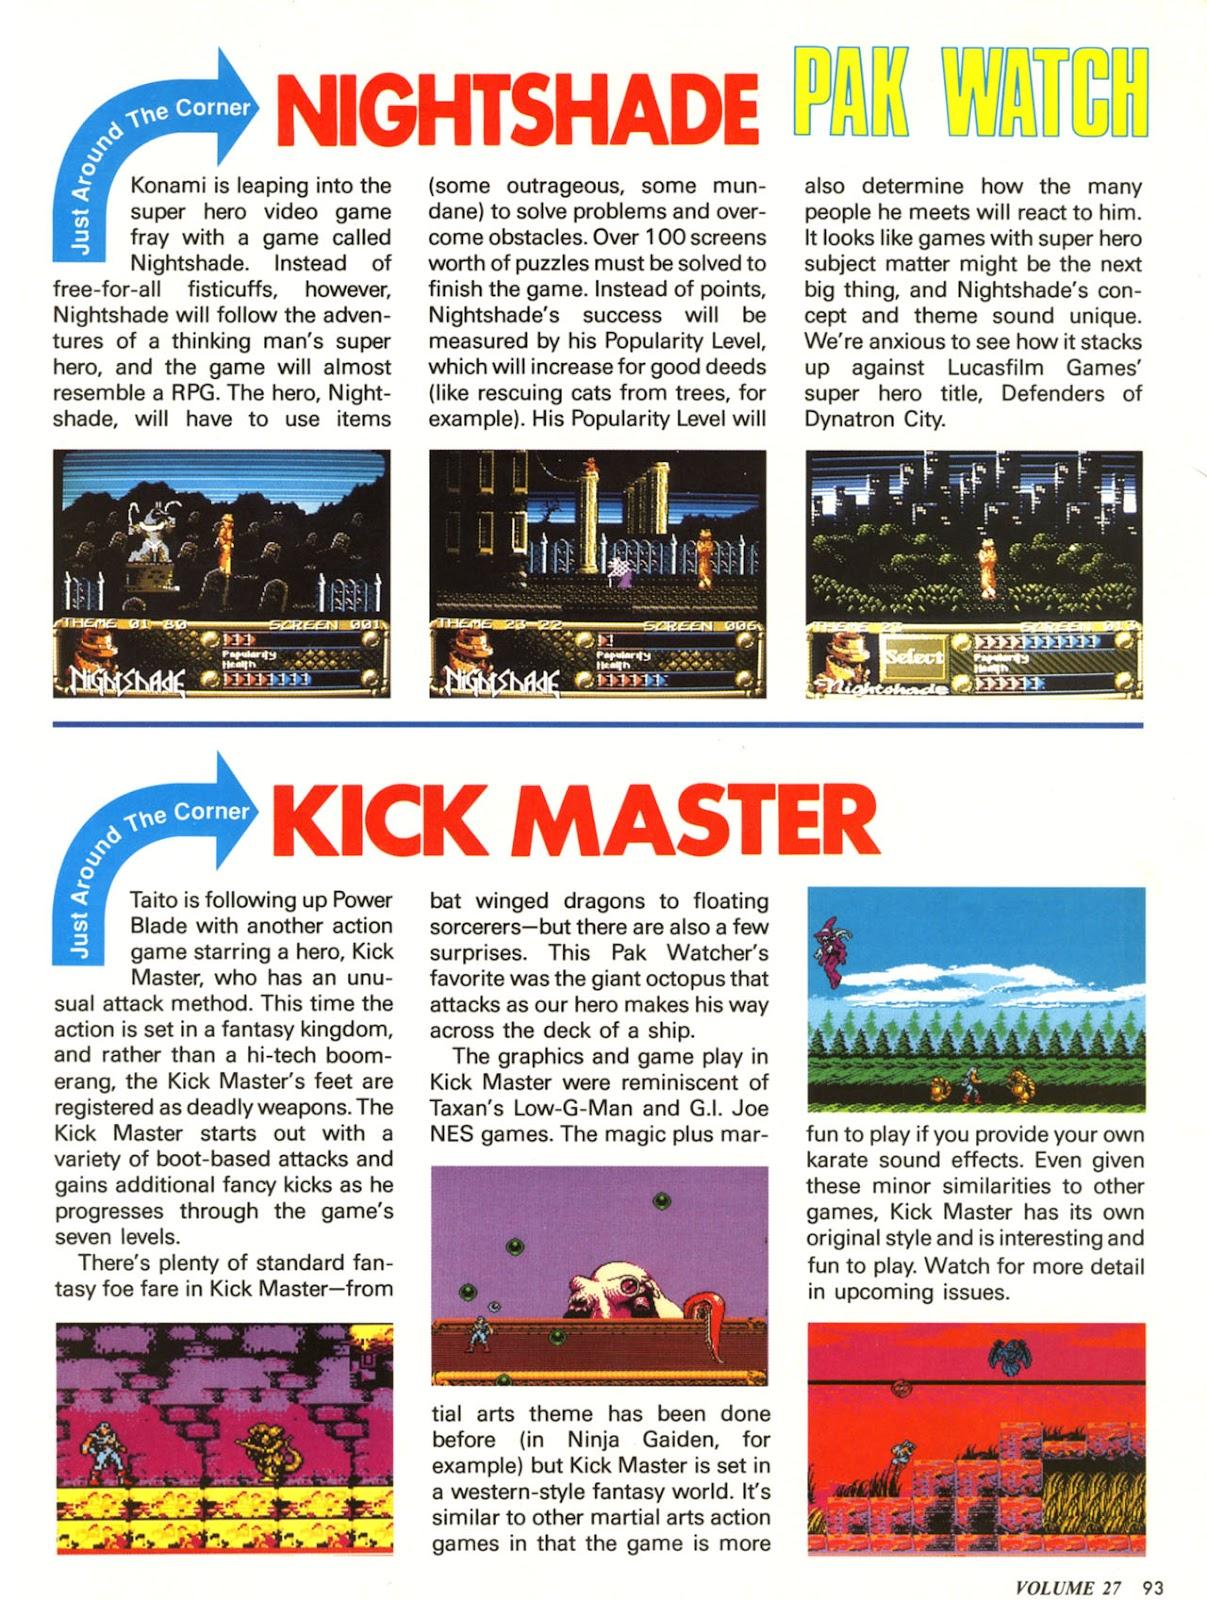 Comic Nintendo Power issue 27